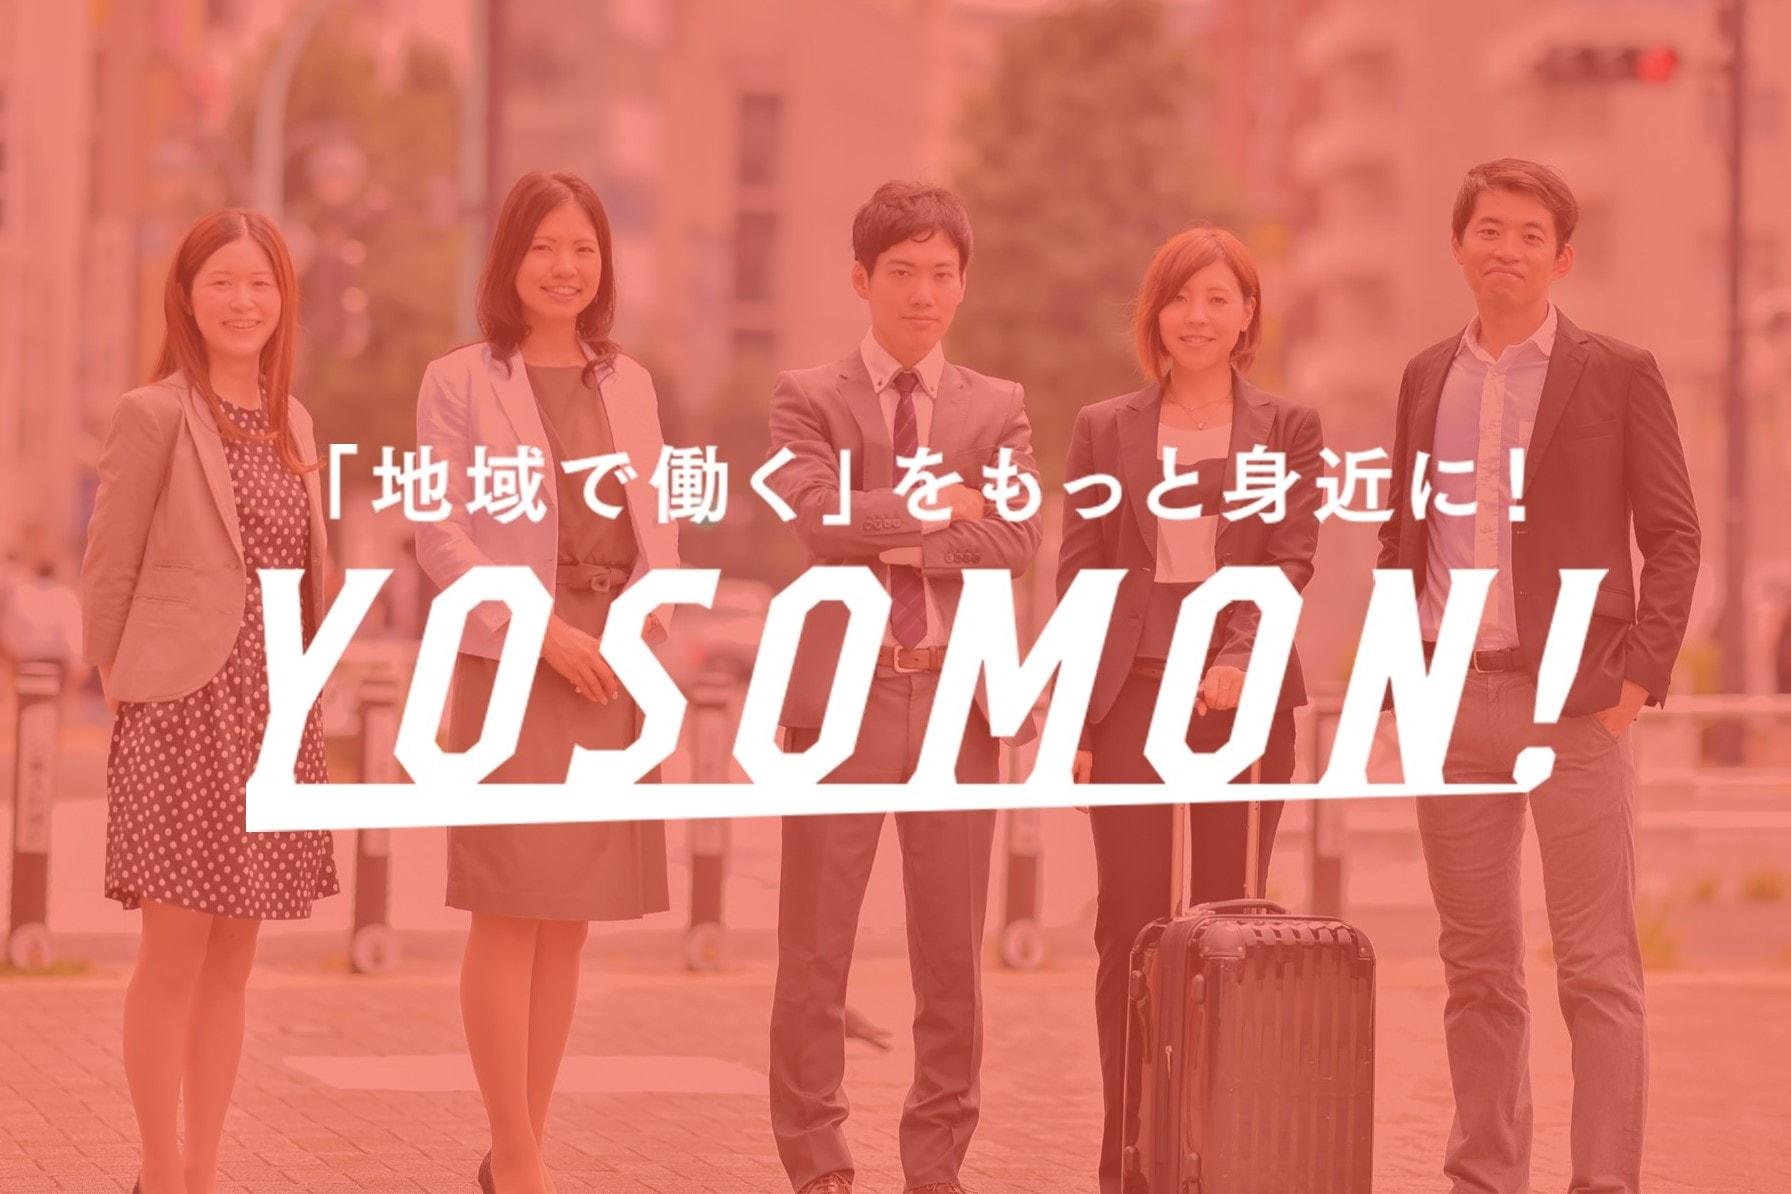 YOSOMON!-「地域で働く」をもっと身近に!